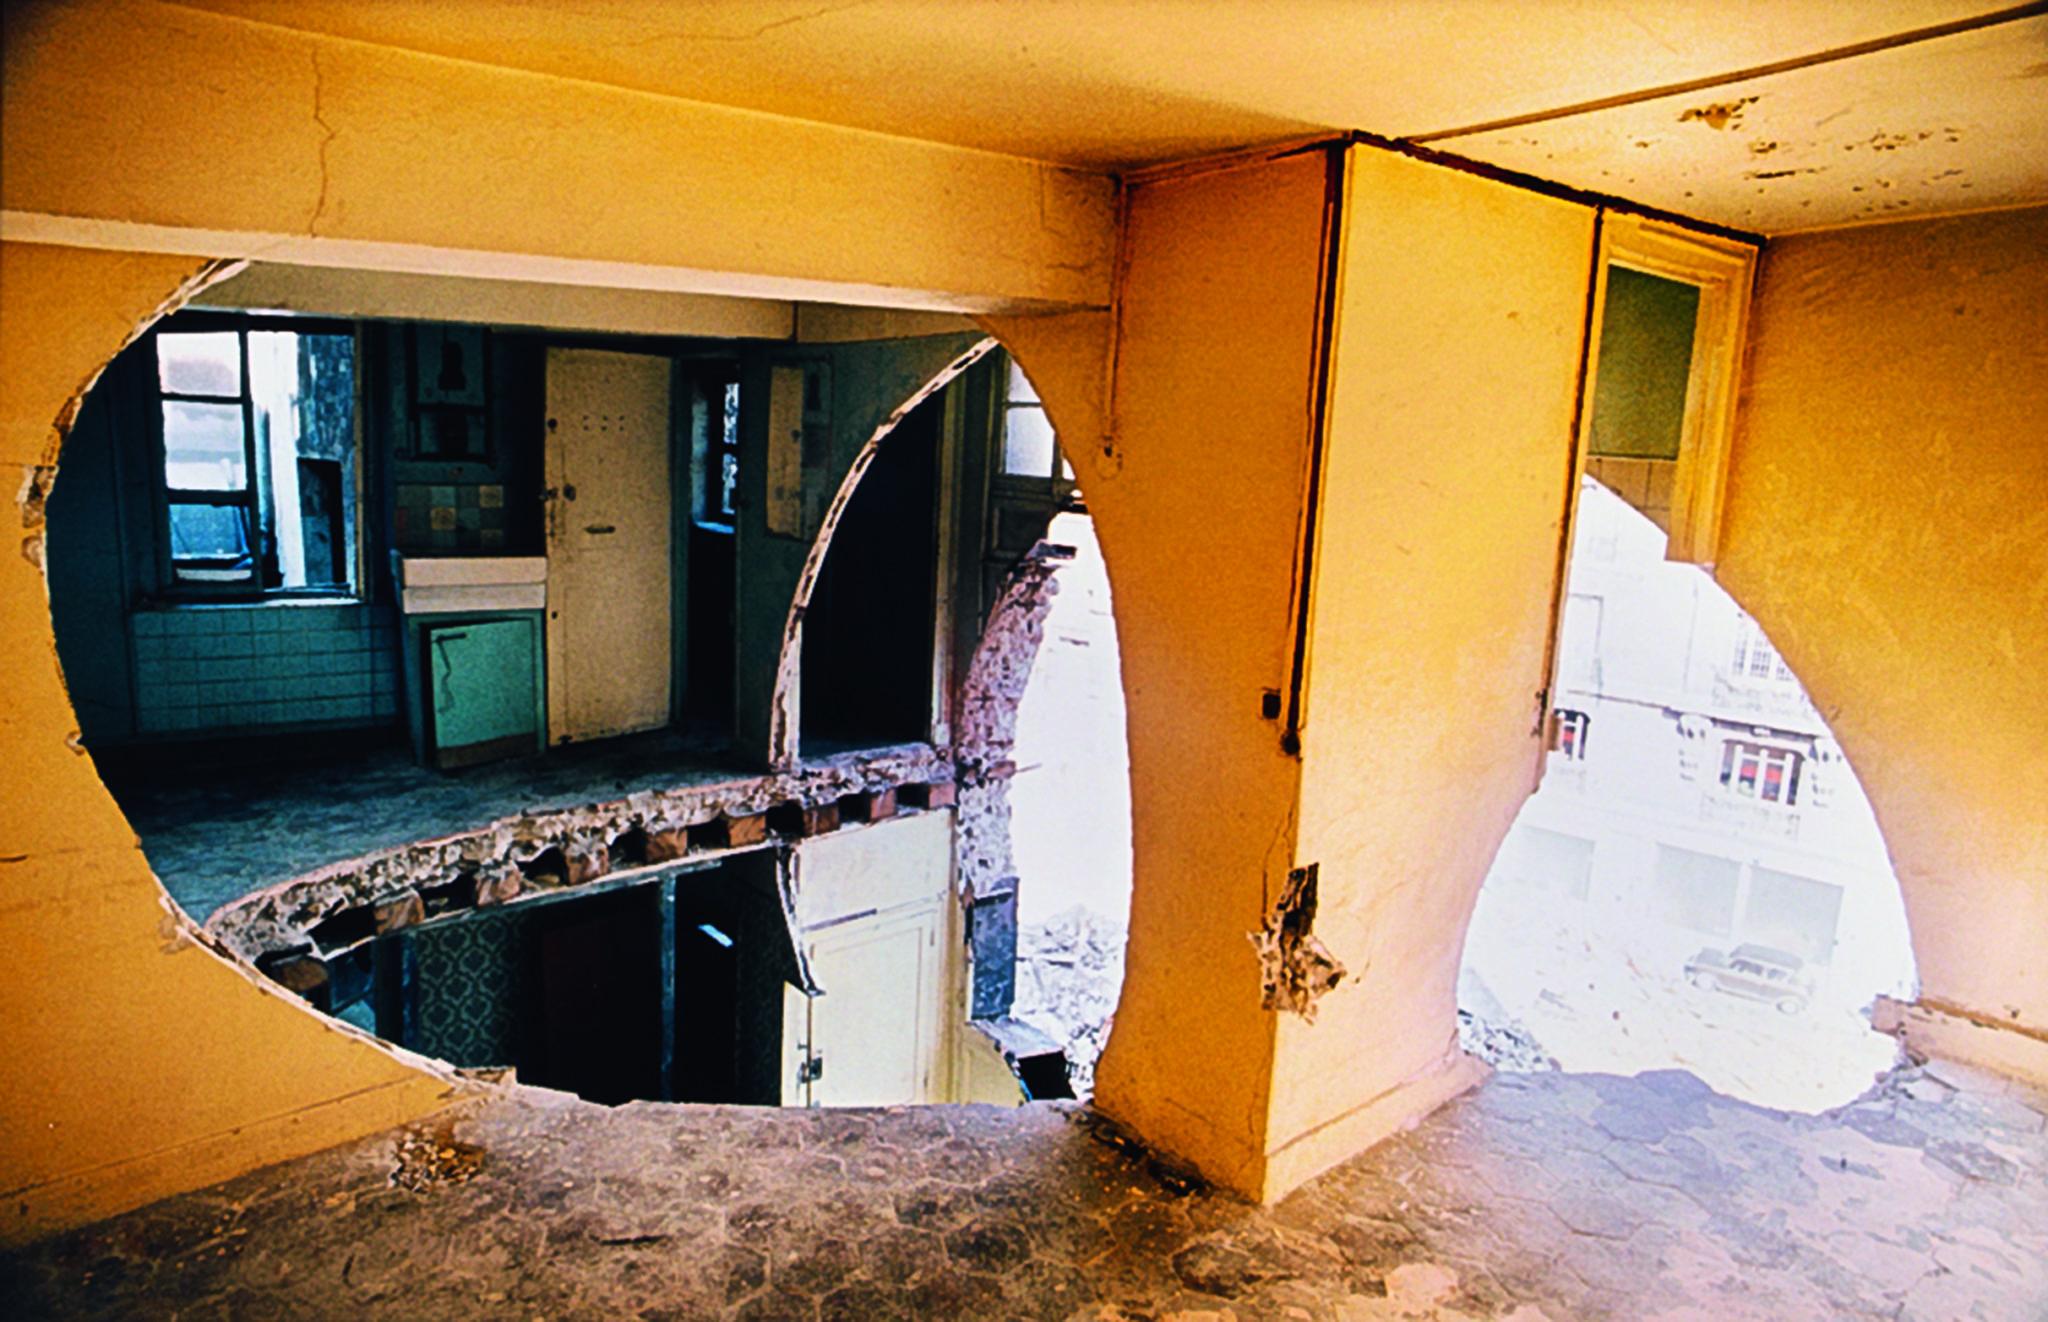 Gordon Matta-Clark Conical Intersect, 1975 Courtesy The Estate of Gordon Matta-Clark et David Zwirner, New York / Londres / Hong Kong. © 2018 The Estate of Gordon Matta-Clark / ADAGP, Paris